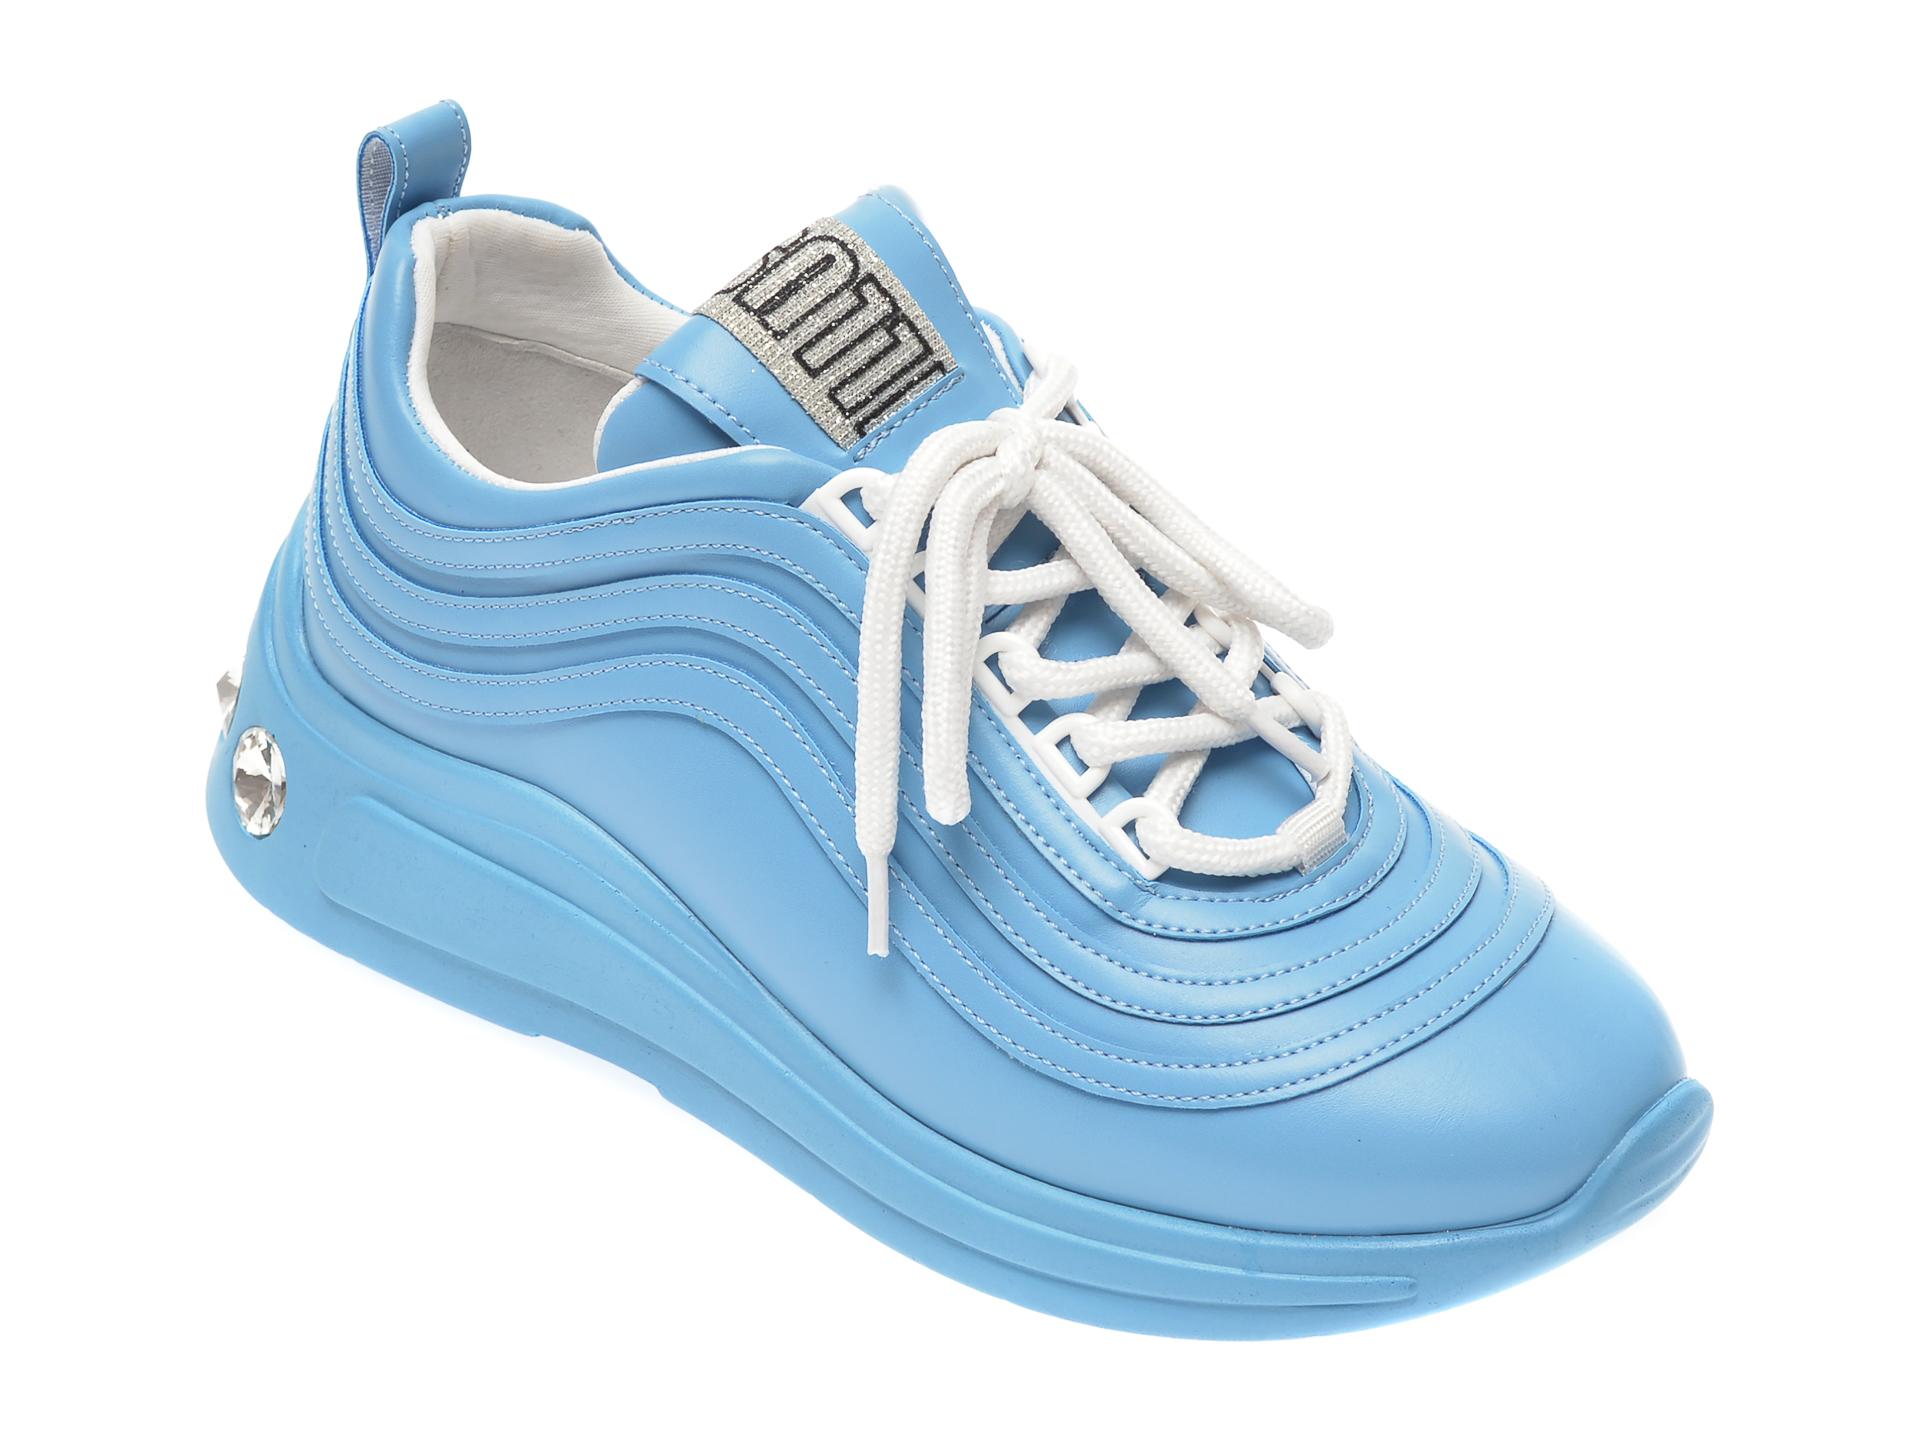 Pantofi sport GRYXX albastri, P43, din piele ecologica